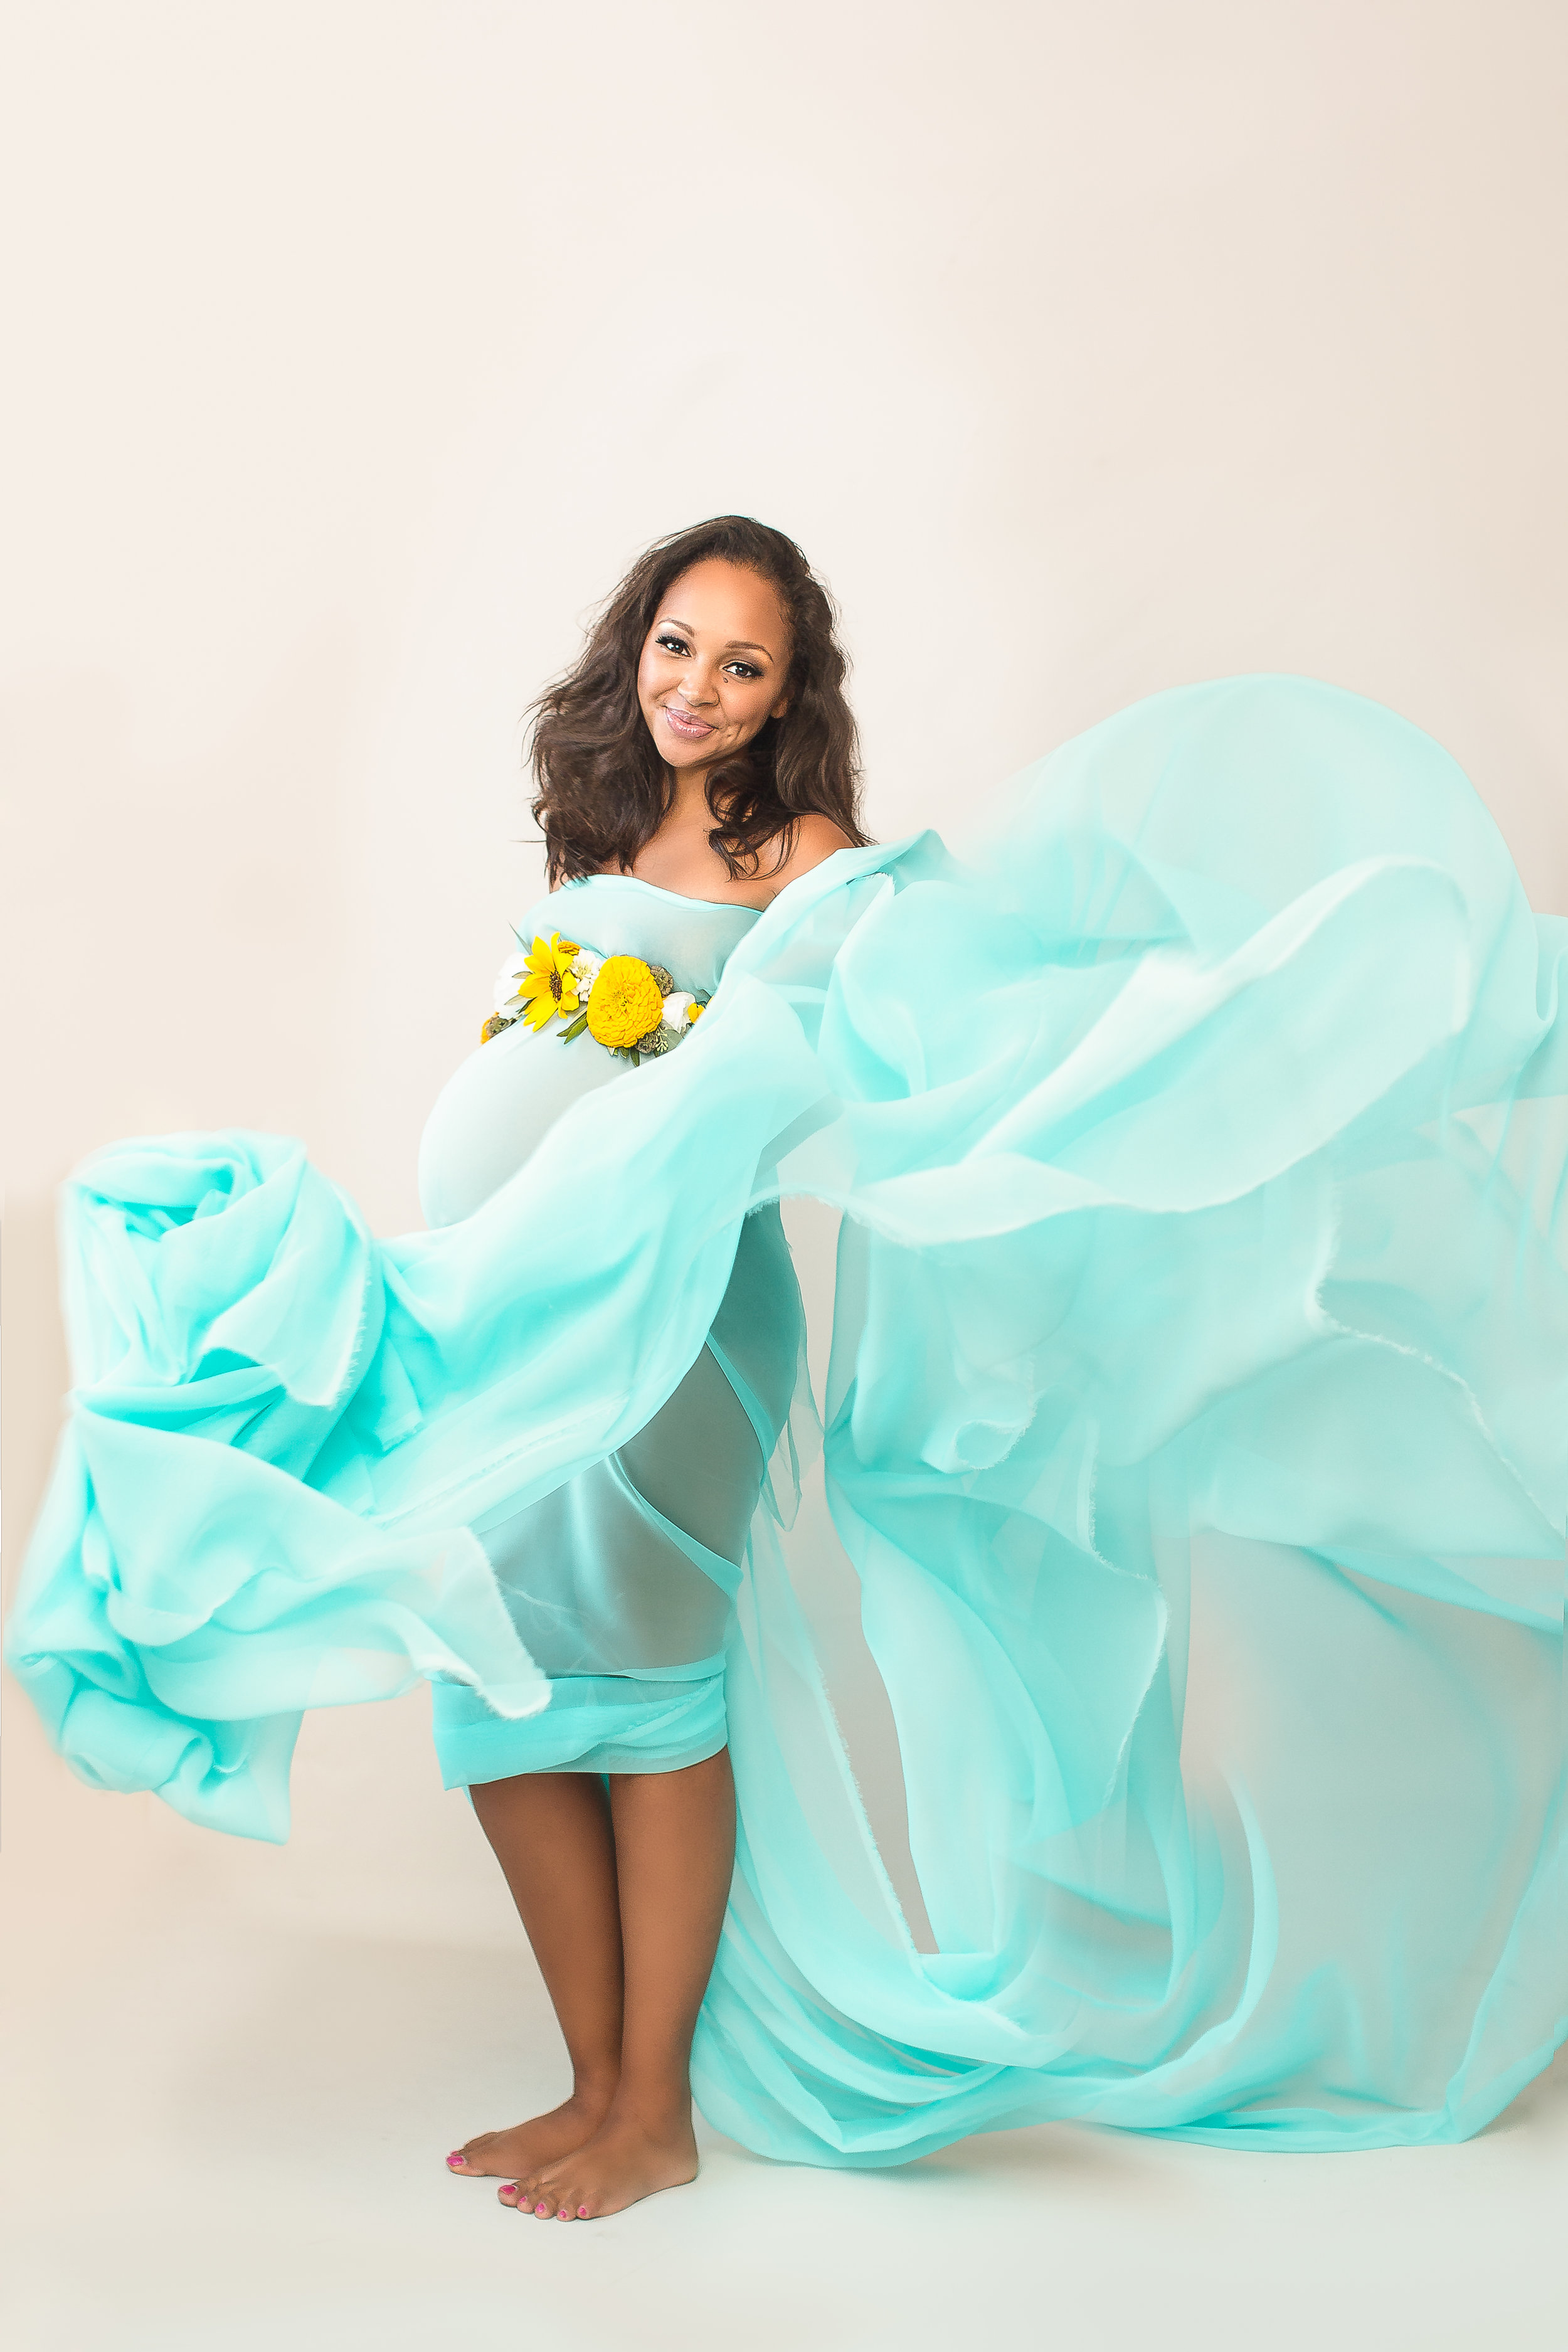 n judah avenue wedding photographer in maryland washington dc and virginia-28.jpg